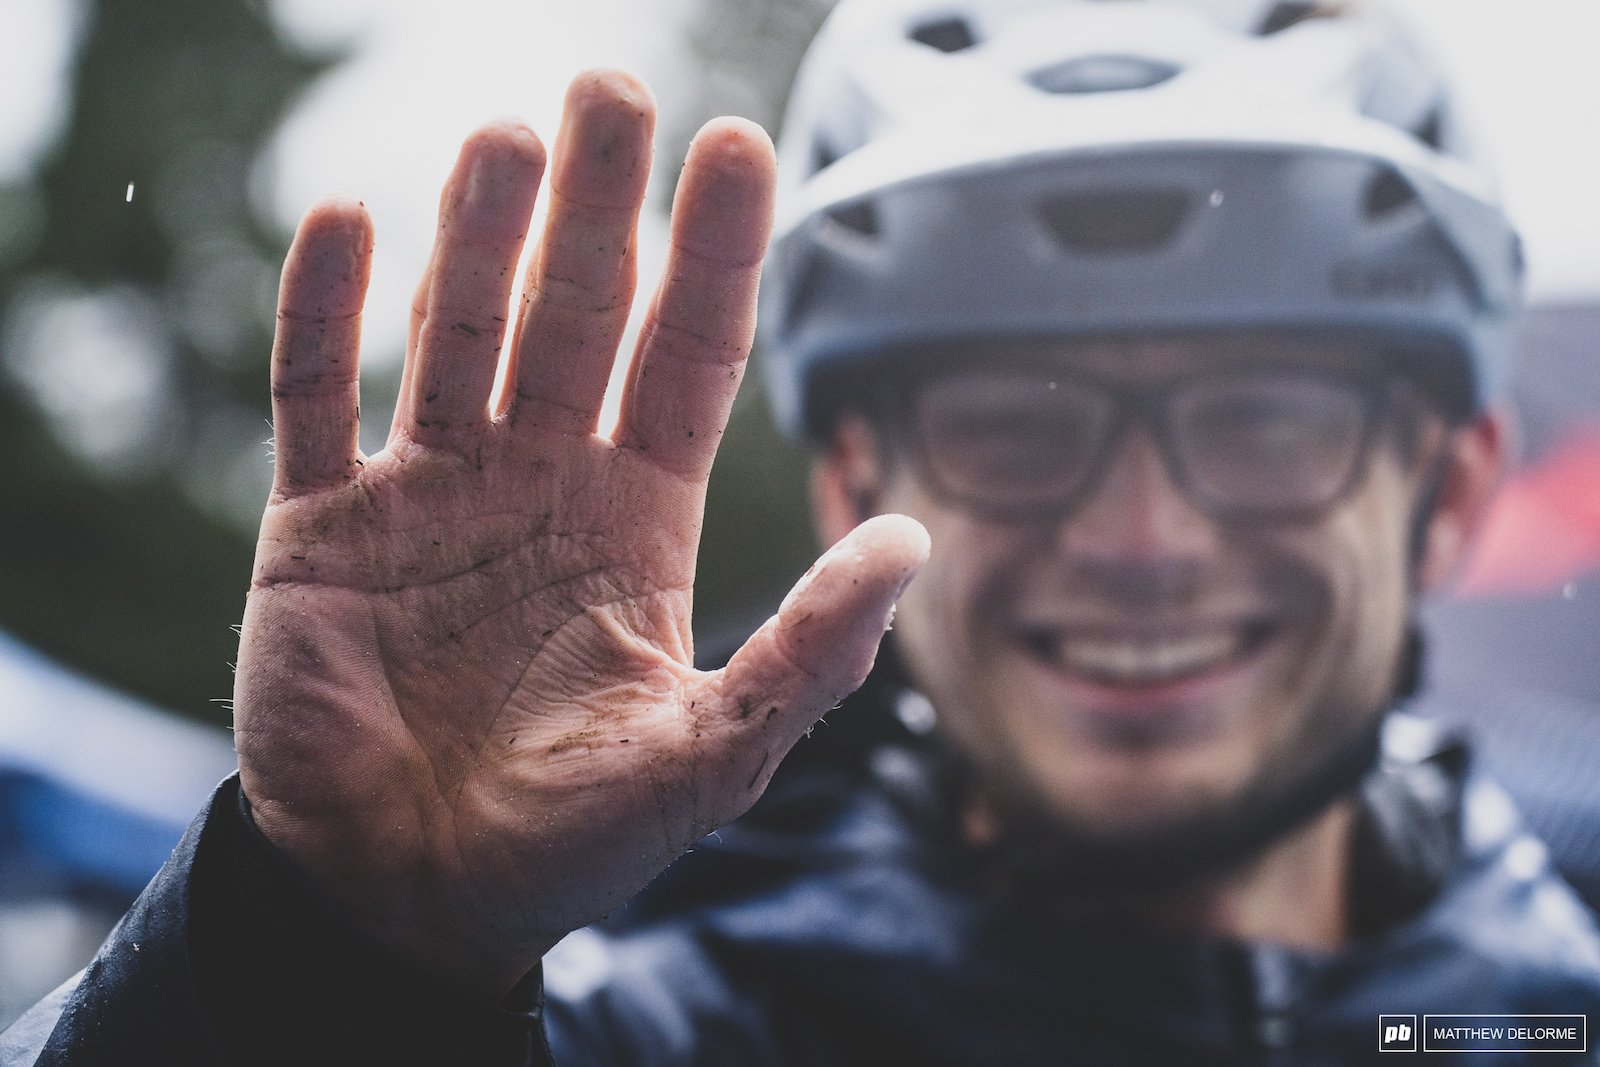 Duncan Philpott- all smiles and prune hands.